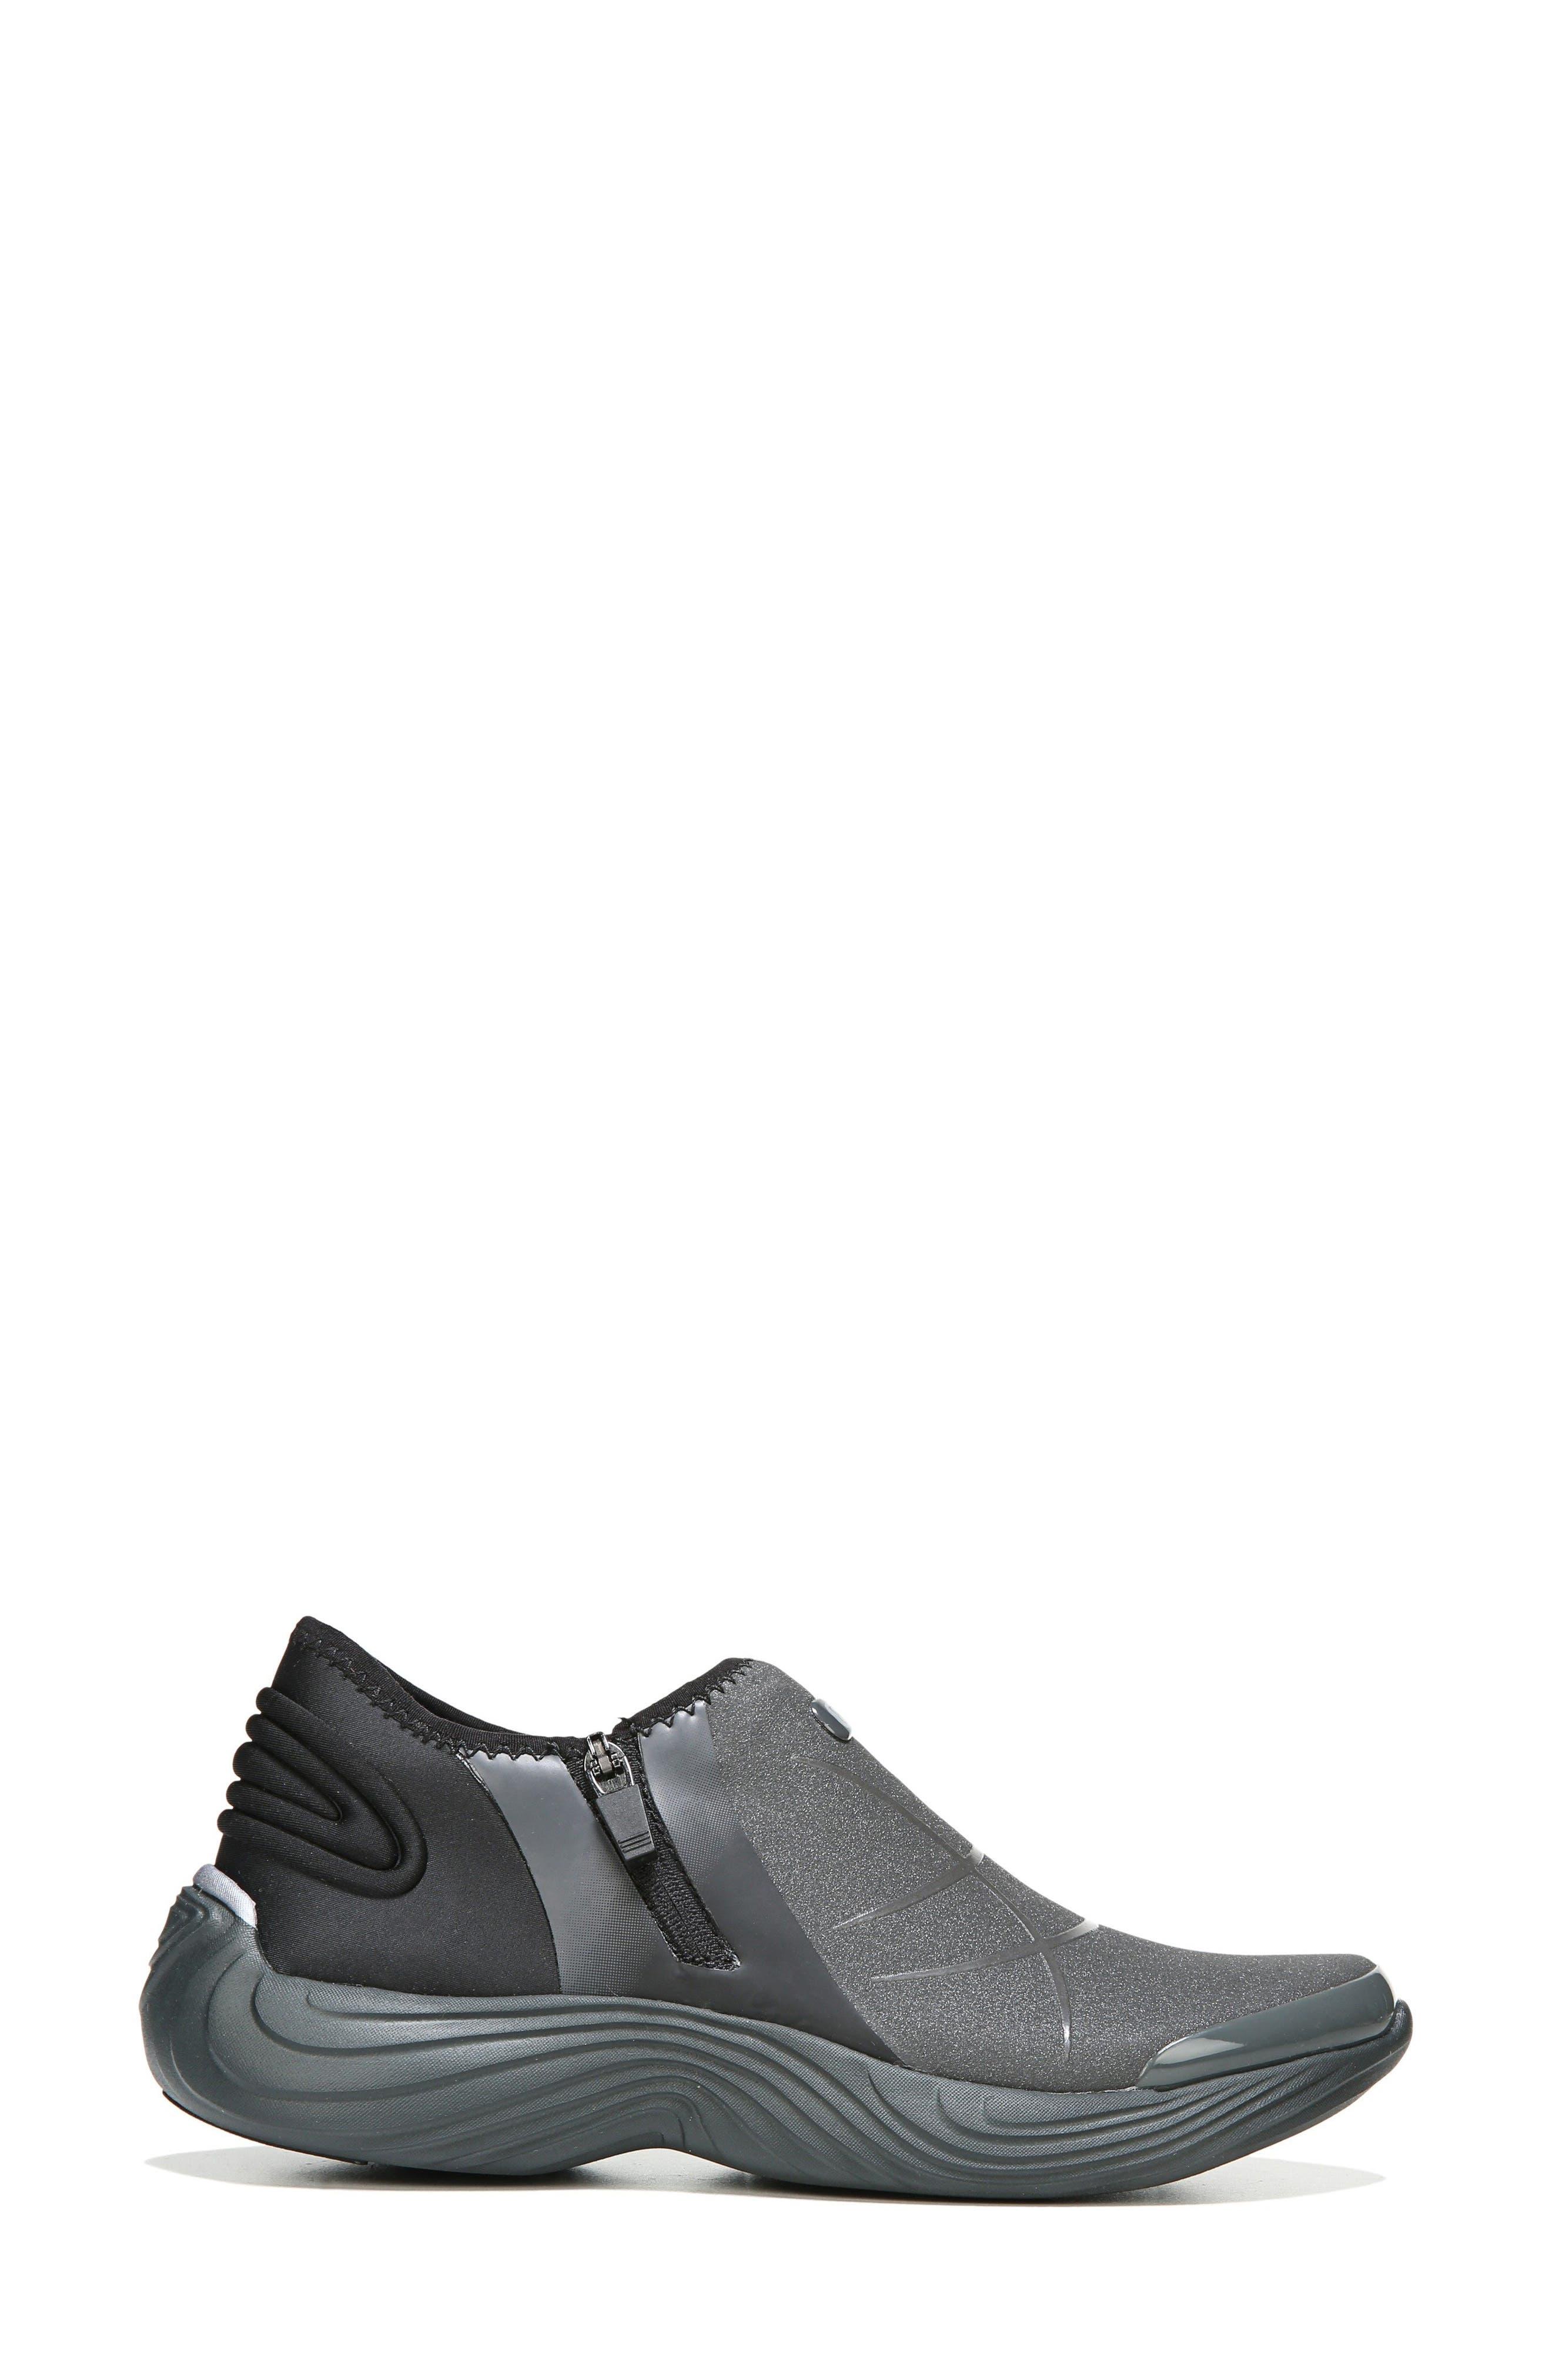 Trilogy Slip-On Sneaker,                             Alternate thumbnail 3, color,                             Grey Fabric